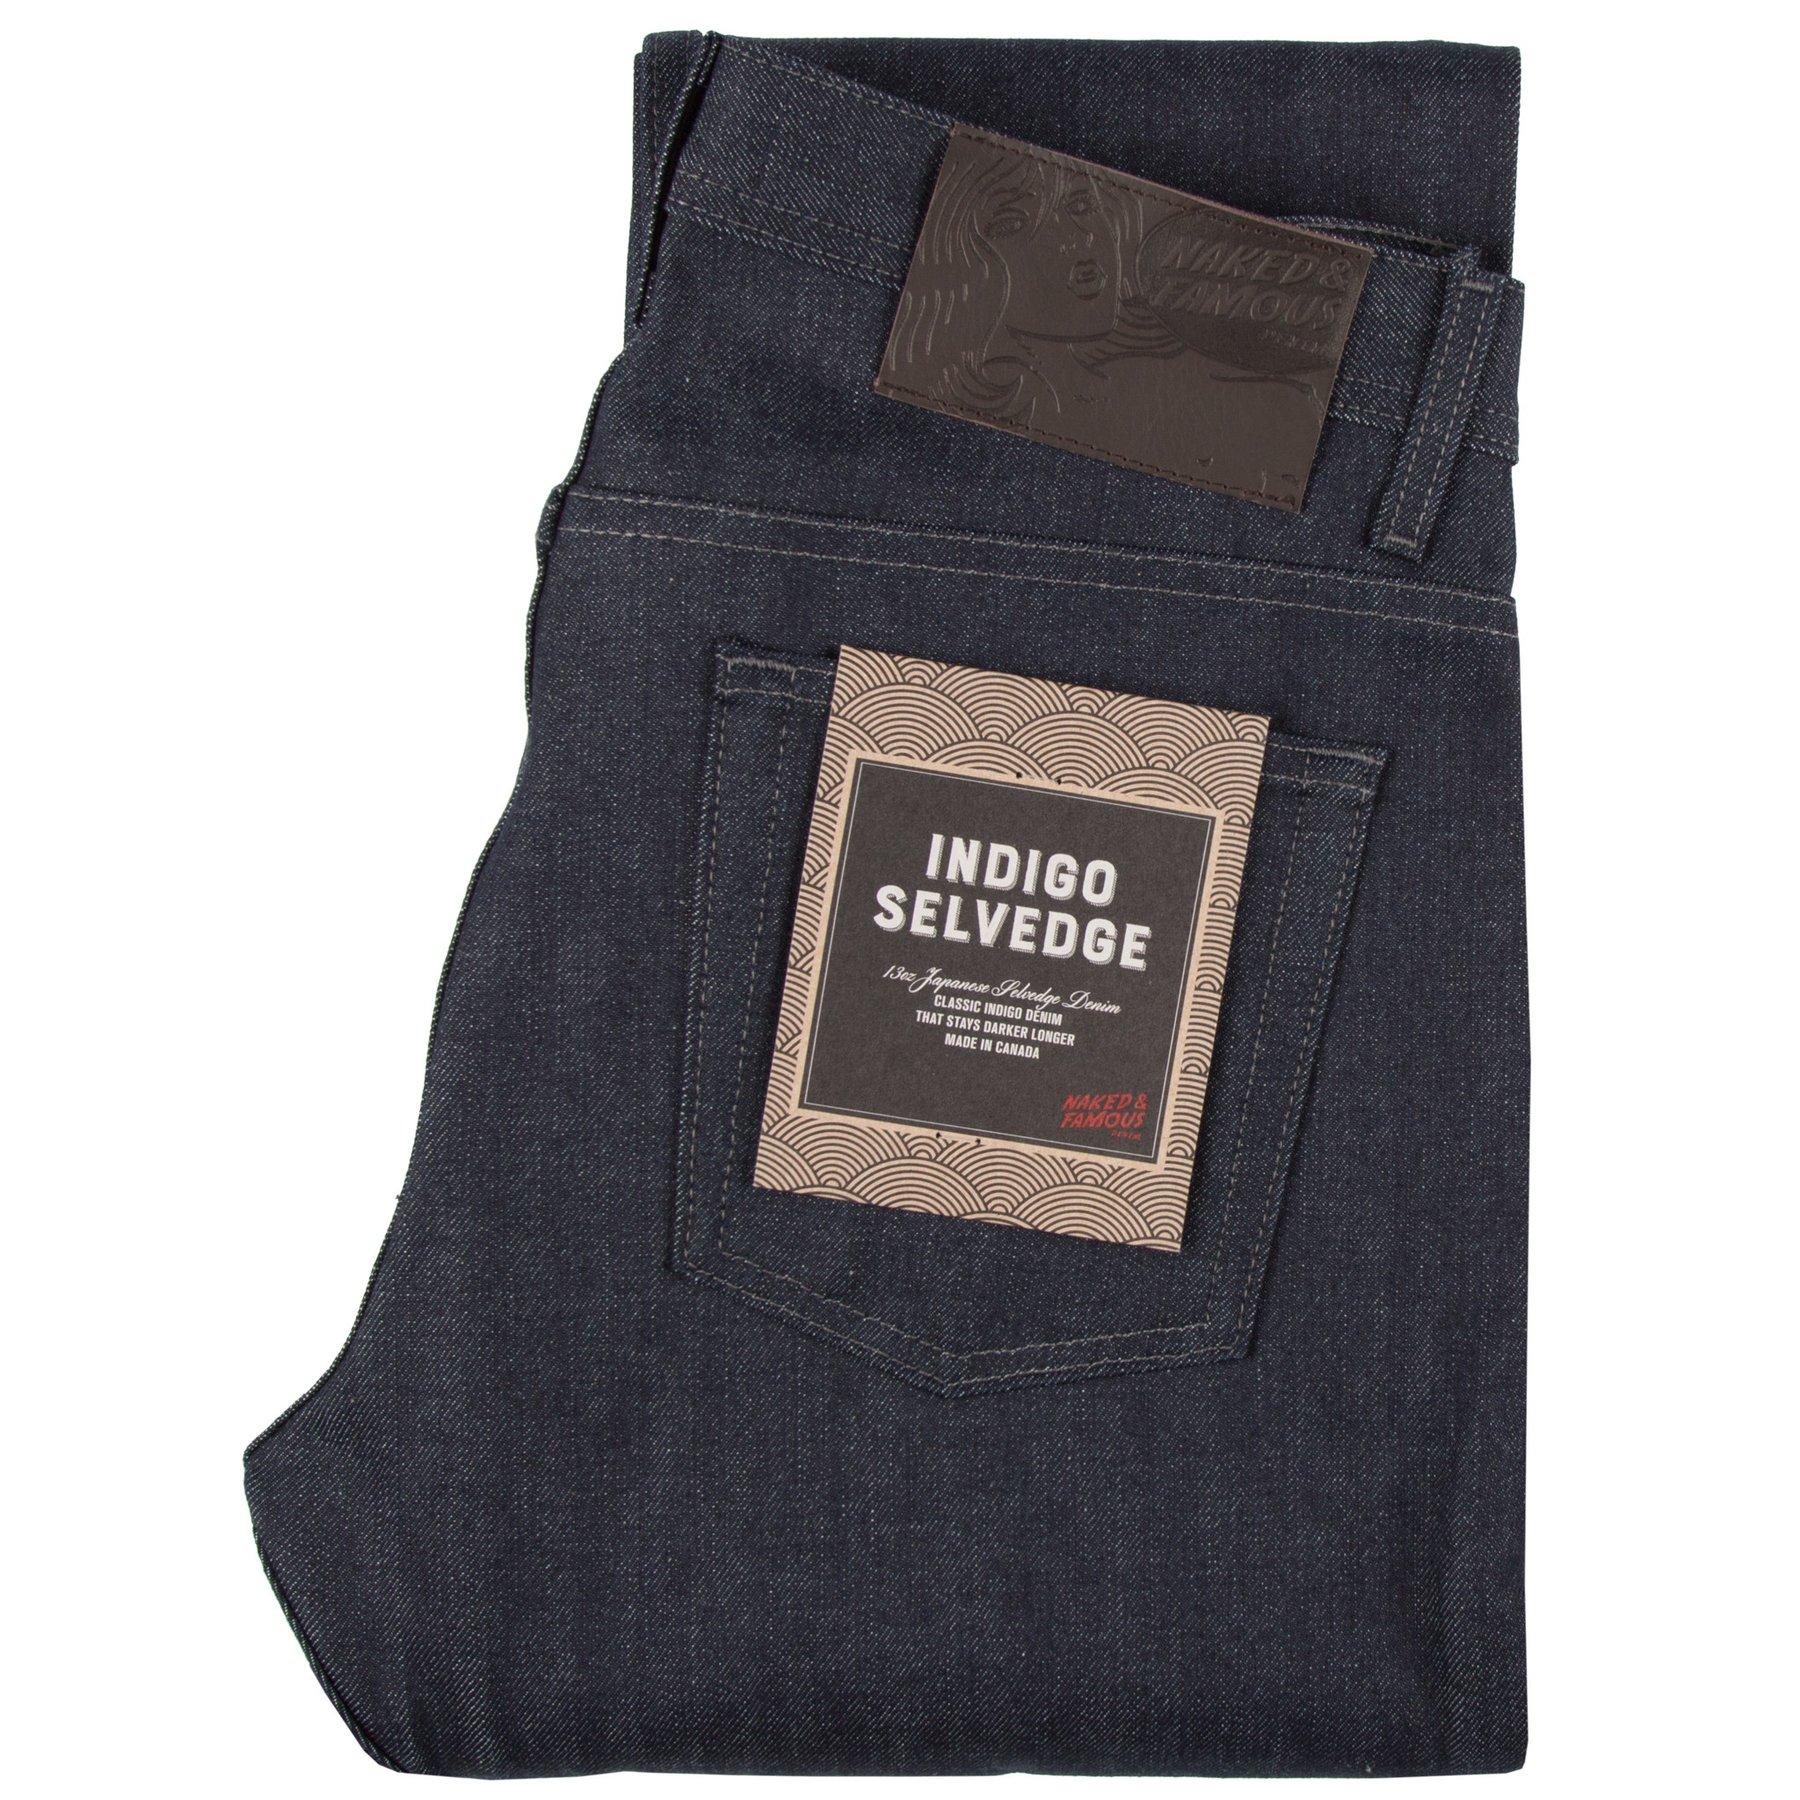 Indigo Selvedge Jeans Folded